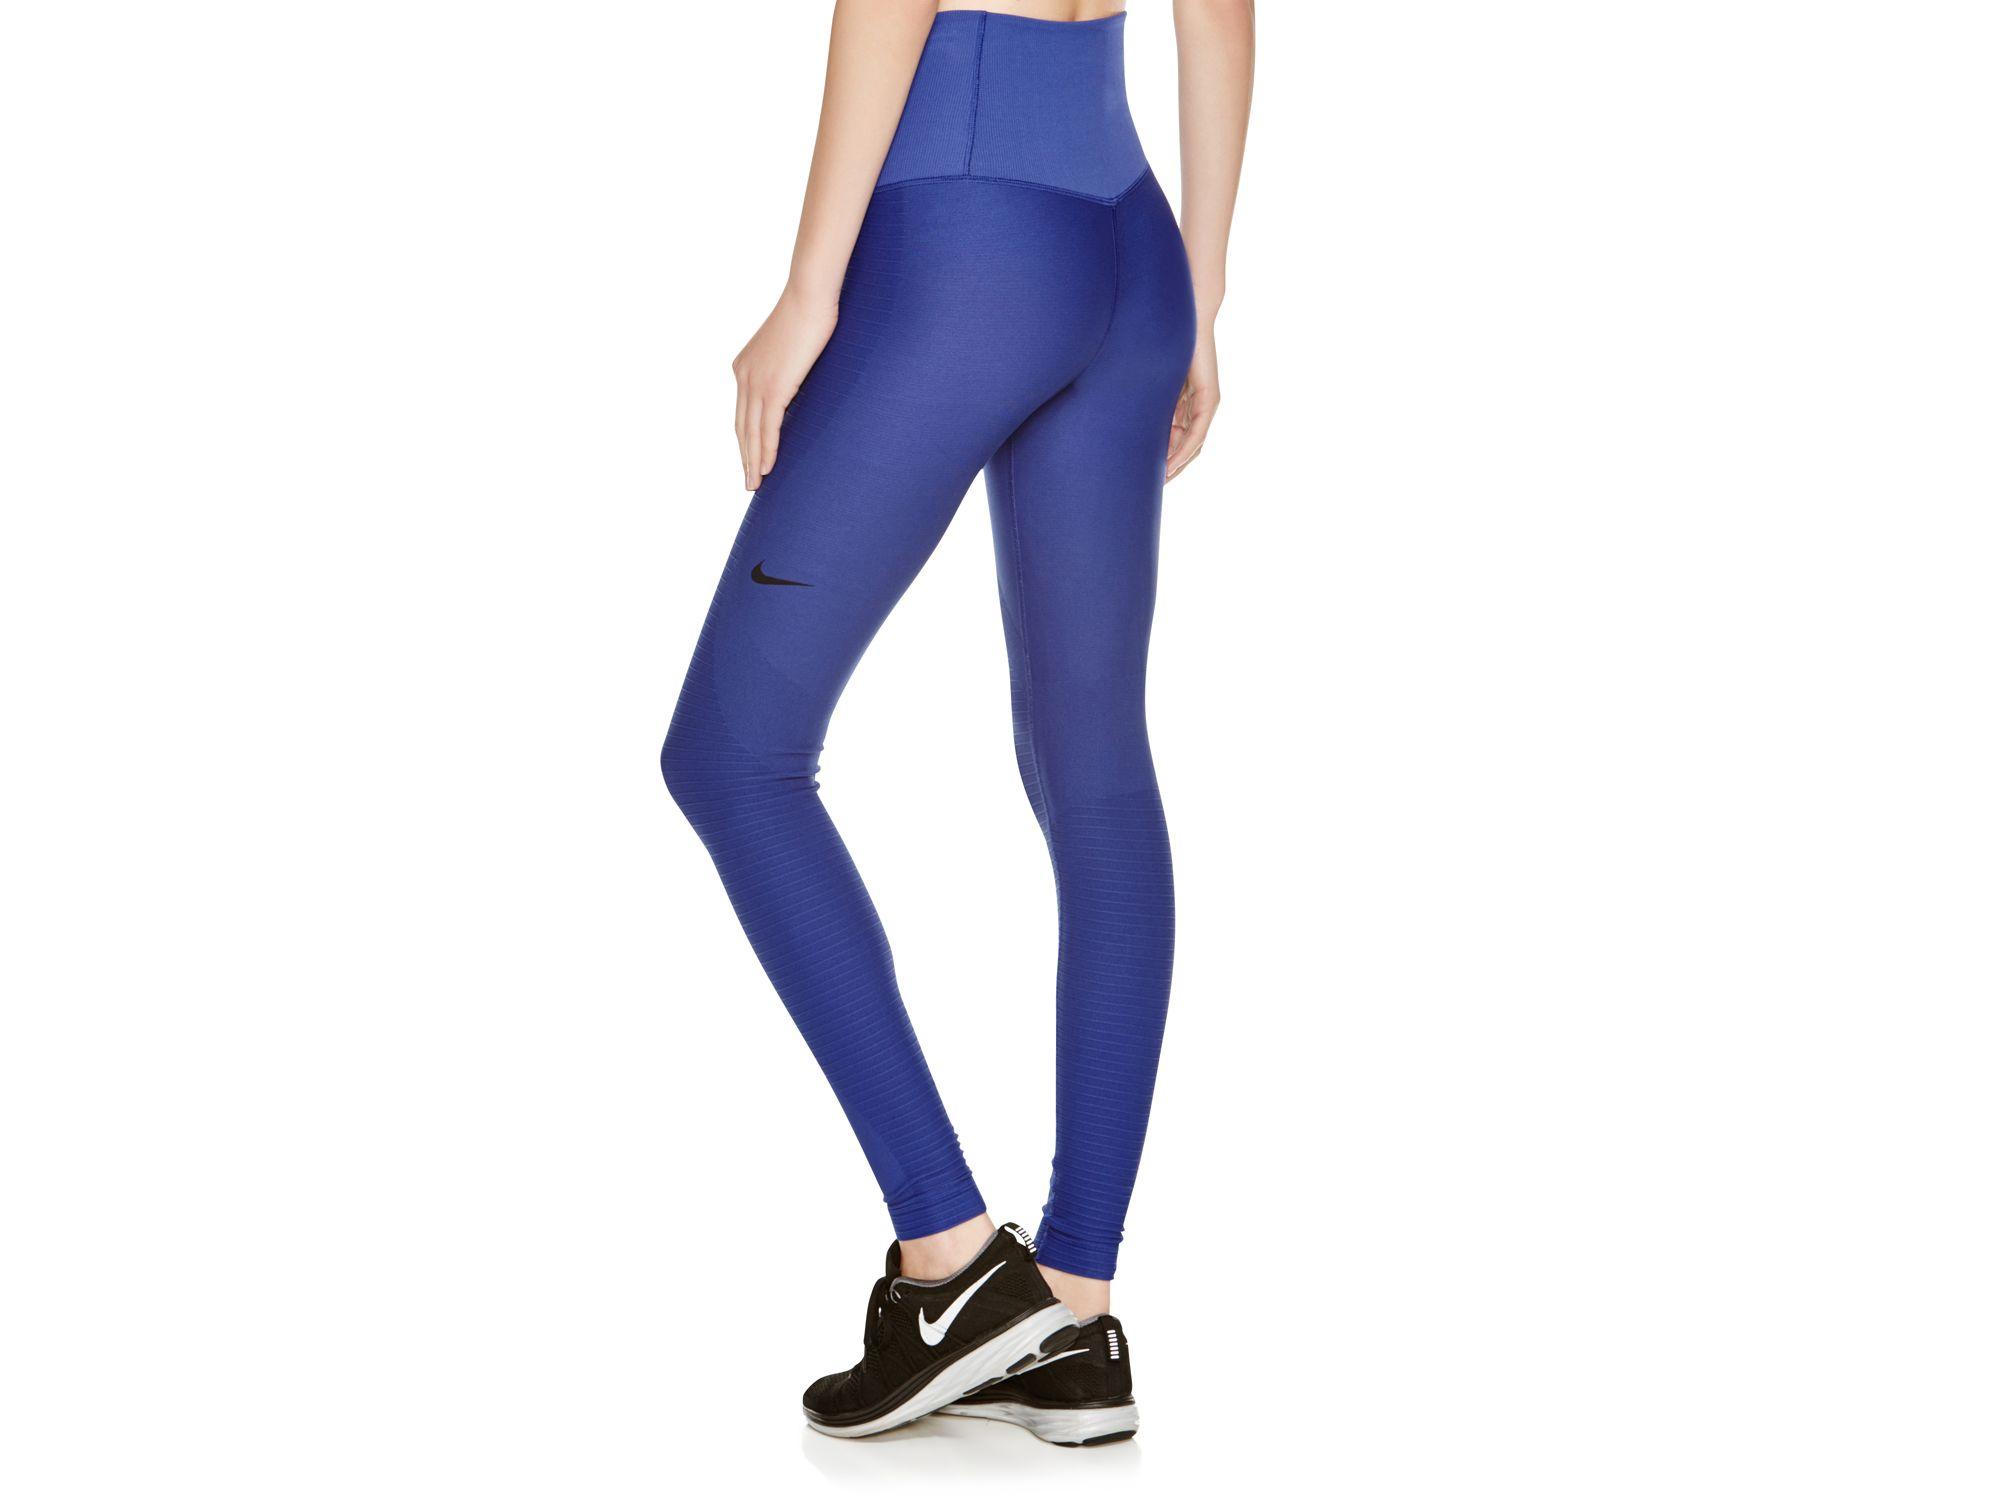 bf7b4016f61ae Nike Zoned Sculpt Leggings in Blue - Lyst